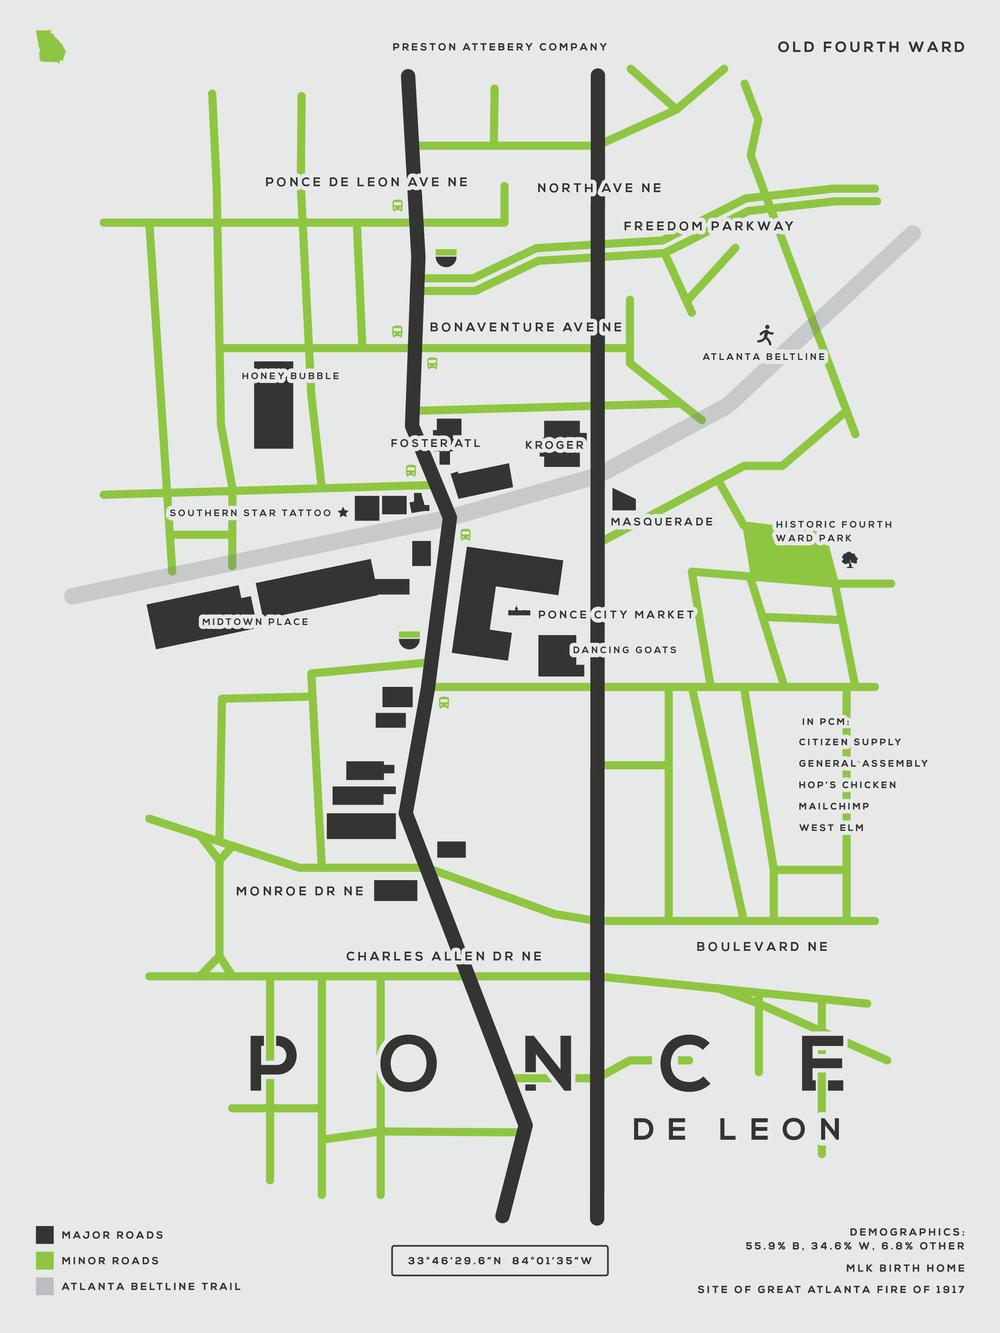 simplecity_maps_neighborhoods_1-01.png